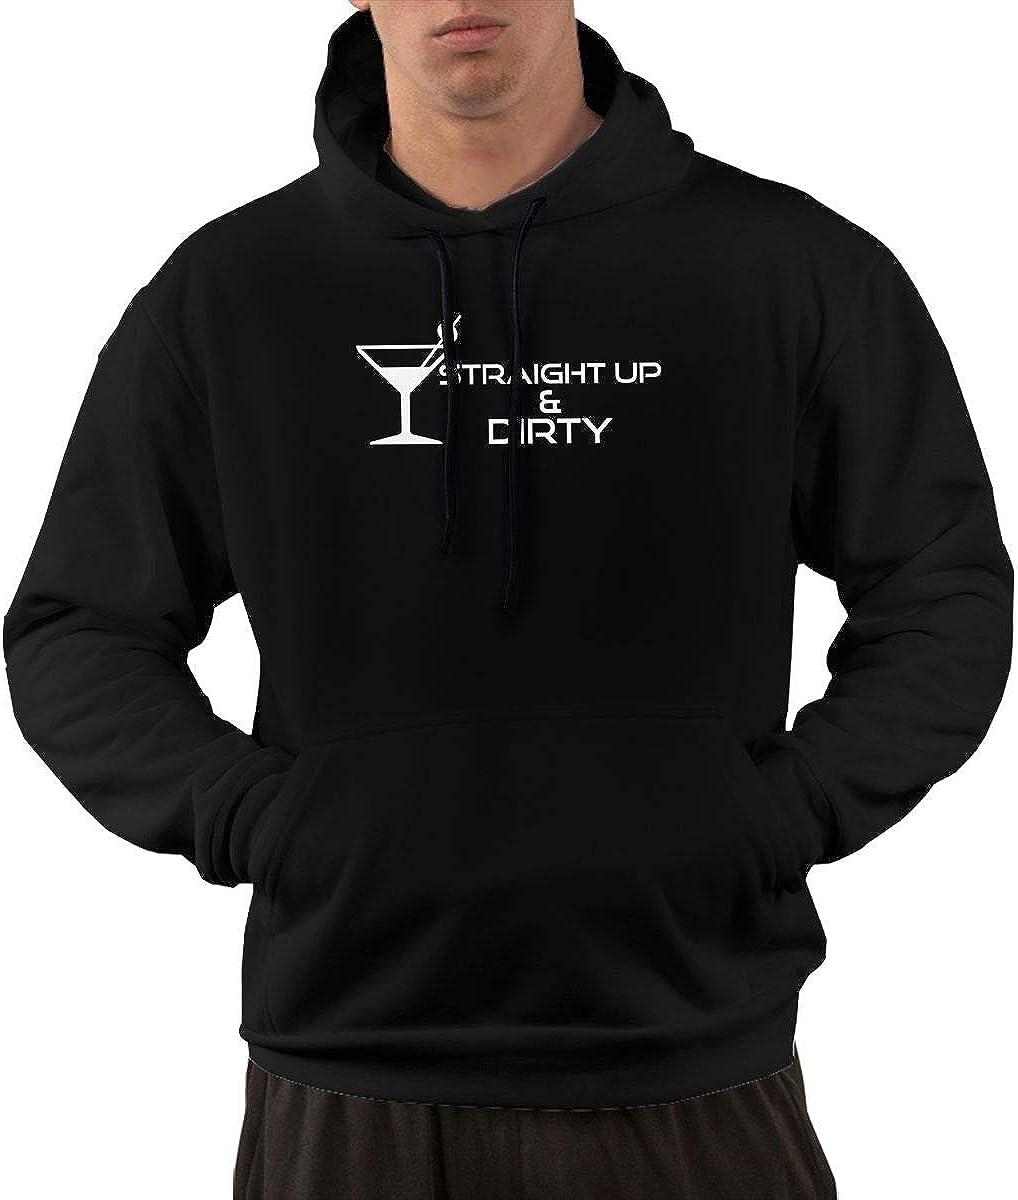 Slotley Mens Straight Up /& Dirty Martini Love Hoodie Sweatshirt